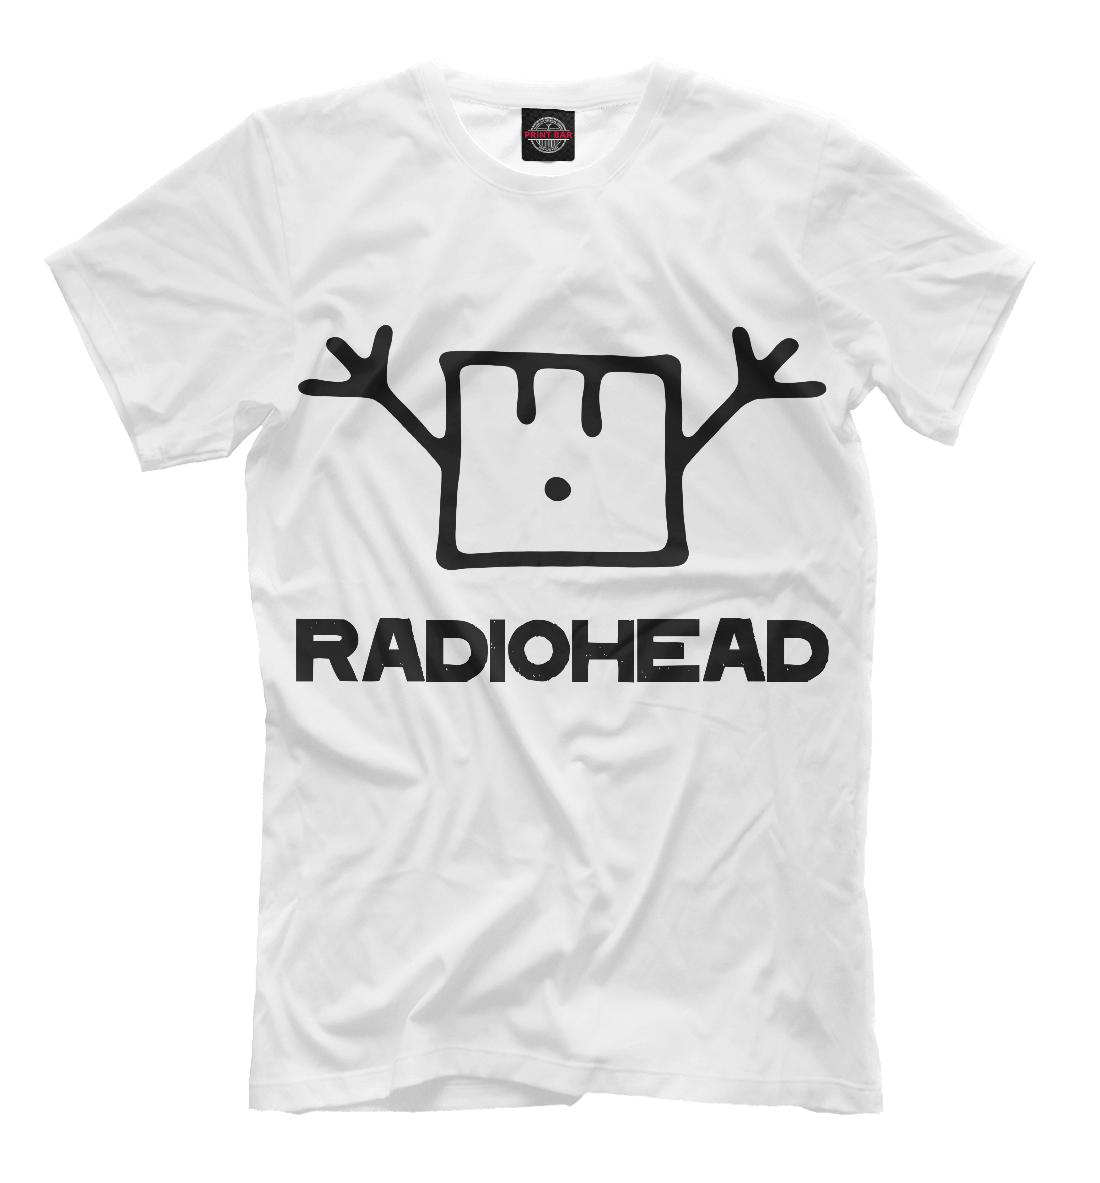 Radiohead, Printbar, Футболки, MZK-142280-fut-2  - купить со скидкой